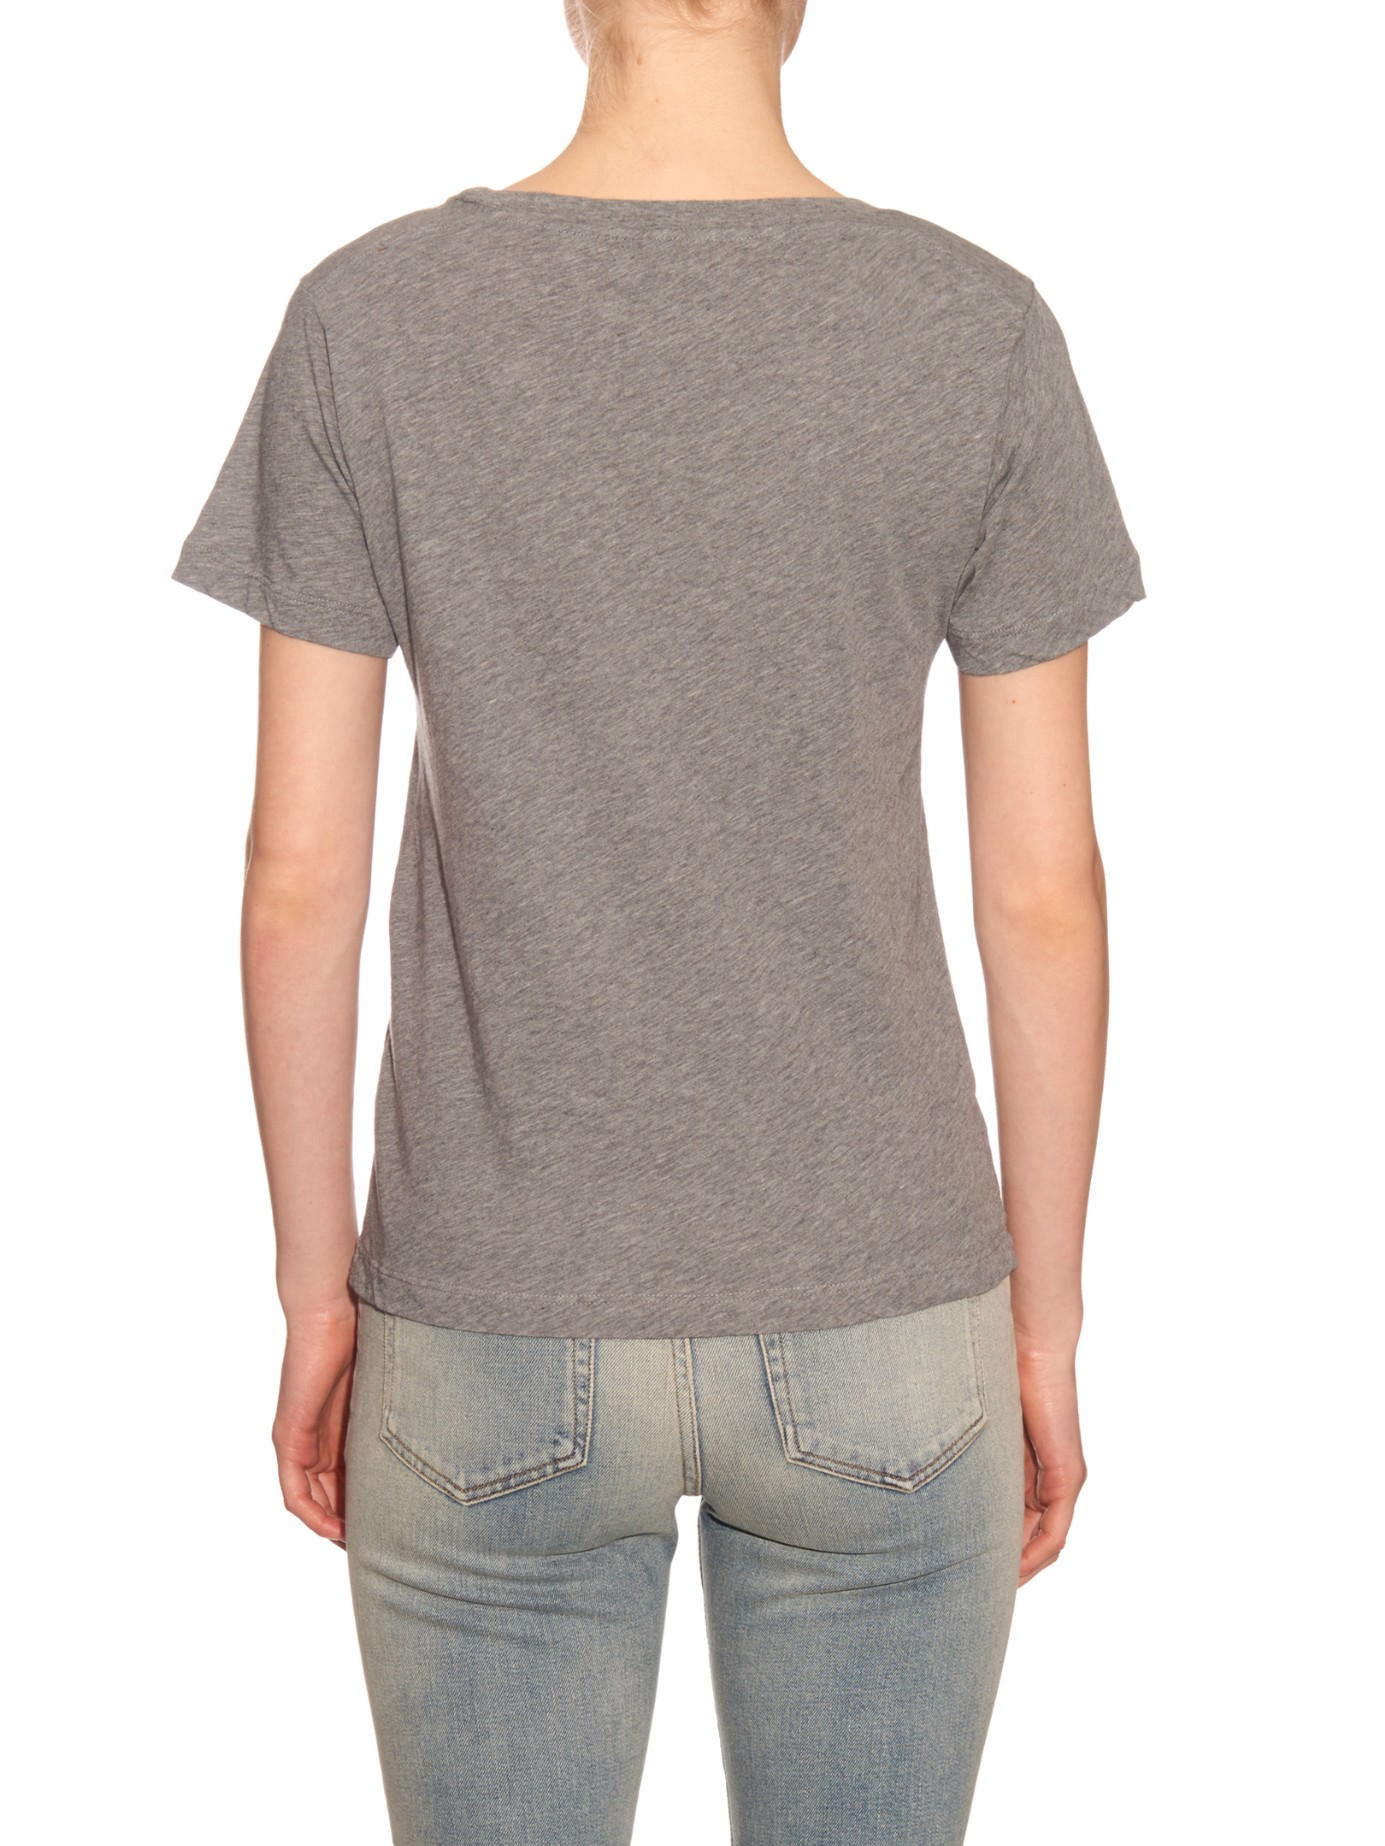 Saint laurent distressed cotton jersey t shirt in gray lyst for Saint laurent shirt womens